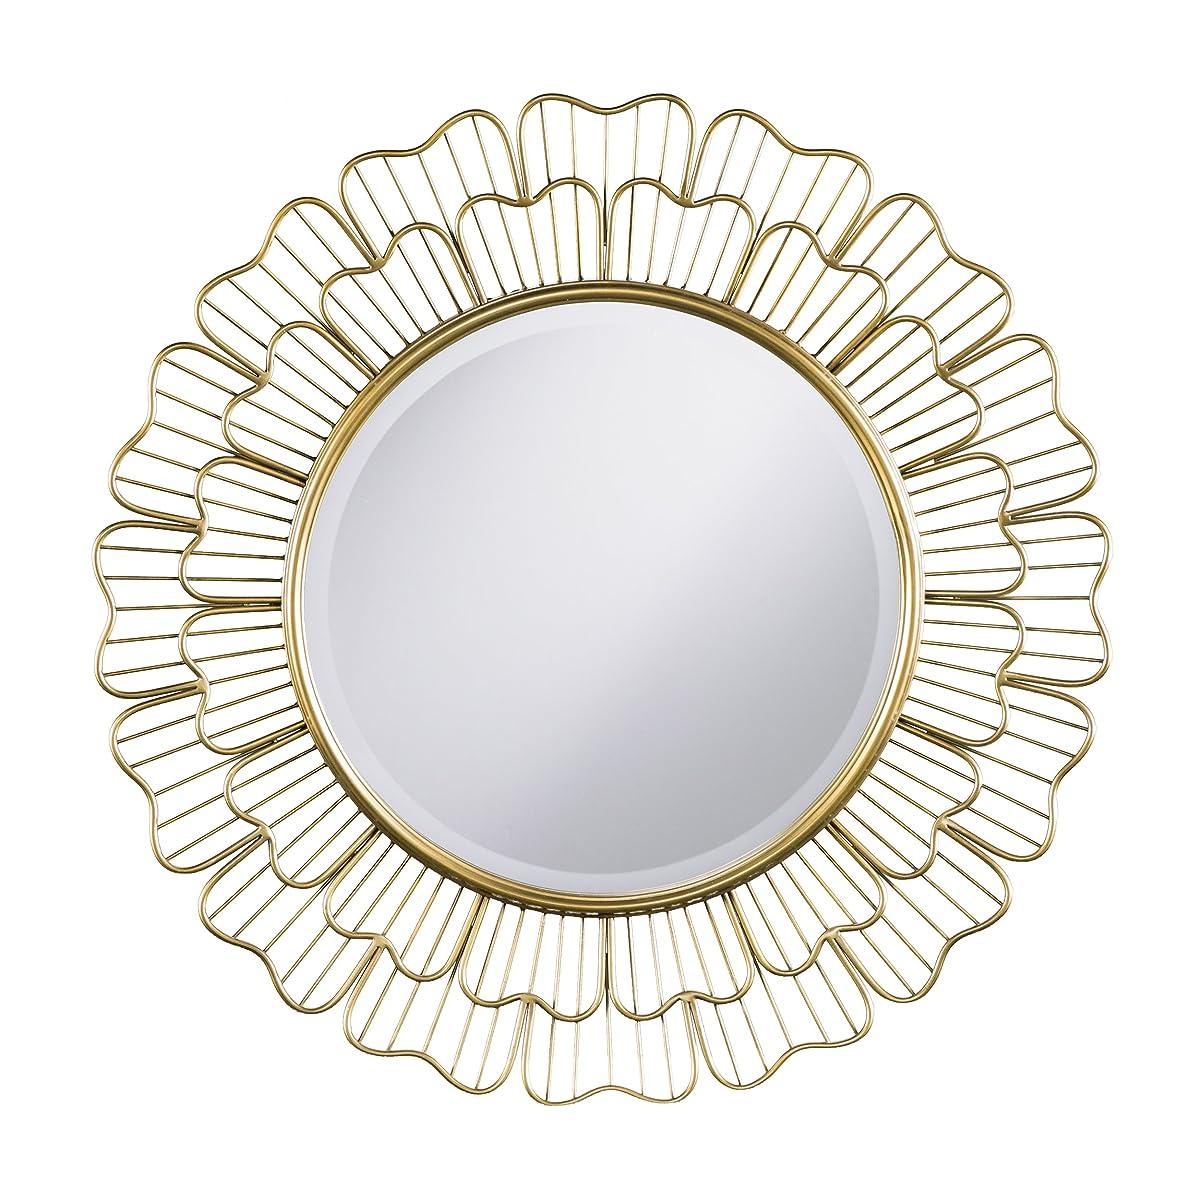 "Furniture HotSpot – Oversized Sunburst Mirror – Antique Bronze - 32.5"" W x 2"" D x 32.5"" H"